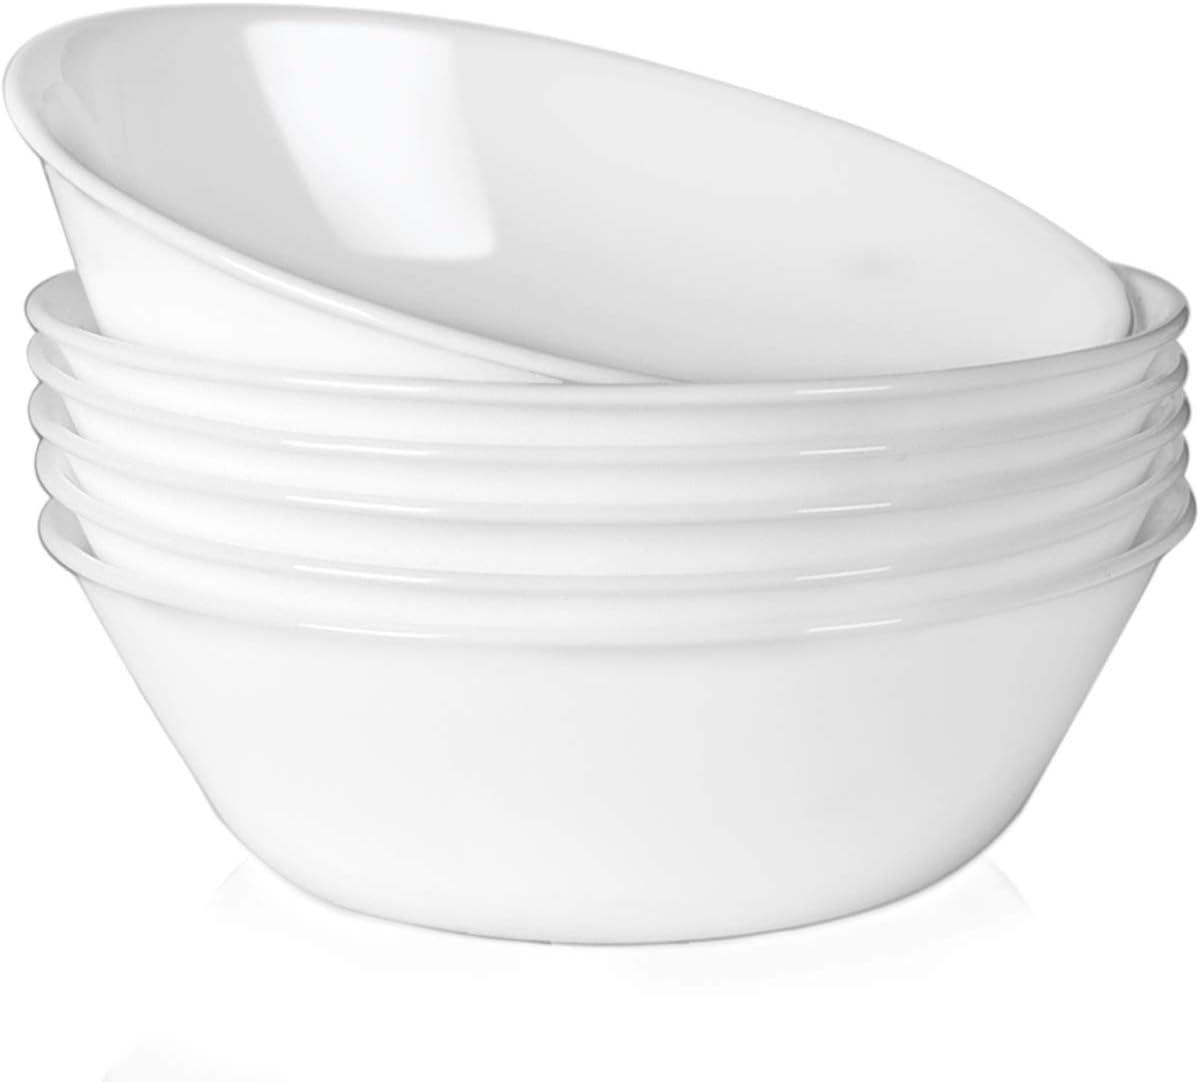 1.3Qt/43 oz Serving Bowls Set of 6-3 oz Ceramic Dip Bowls Set of 6